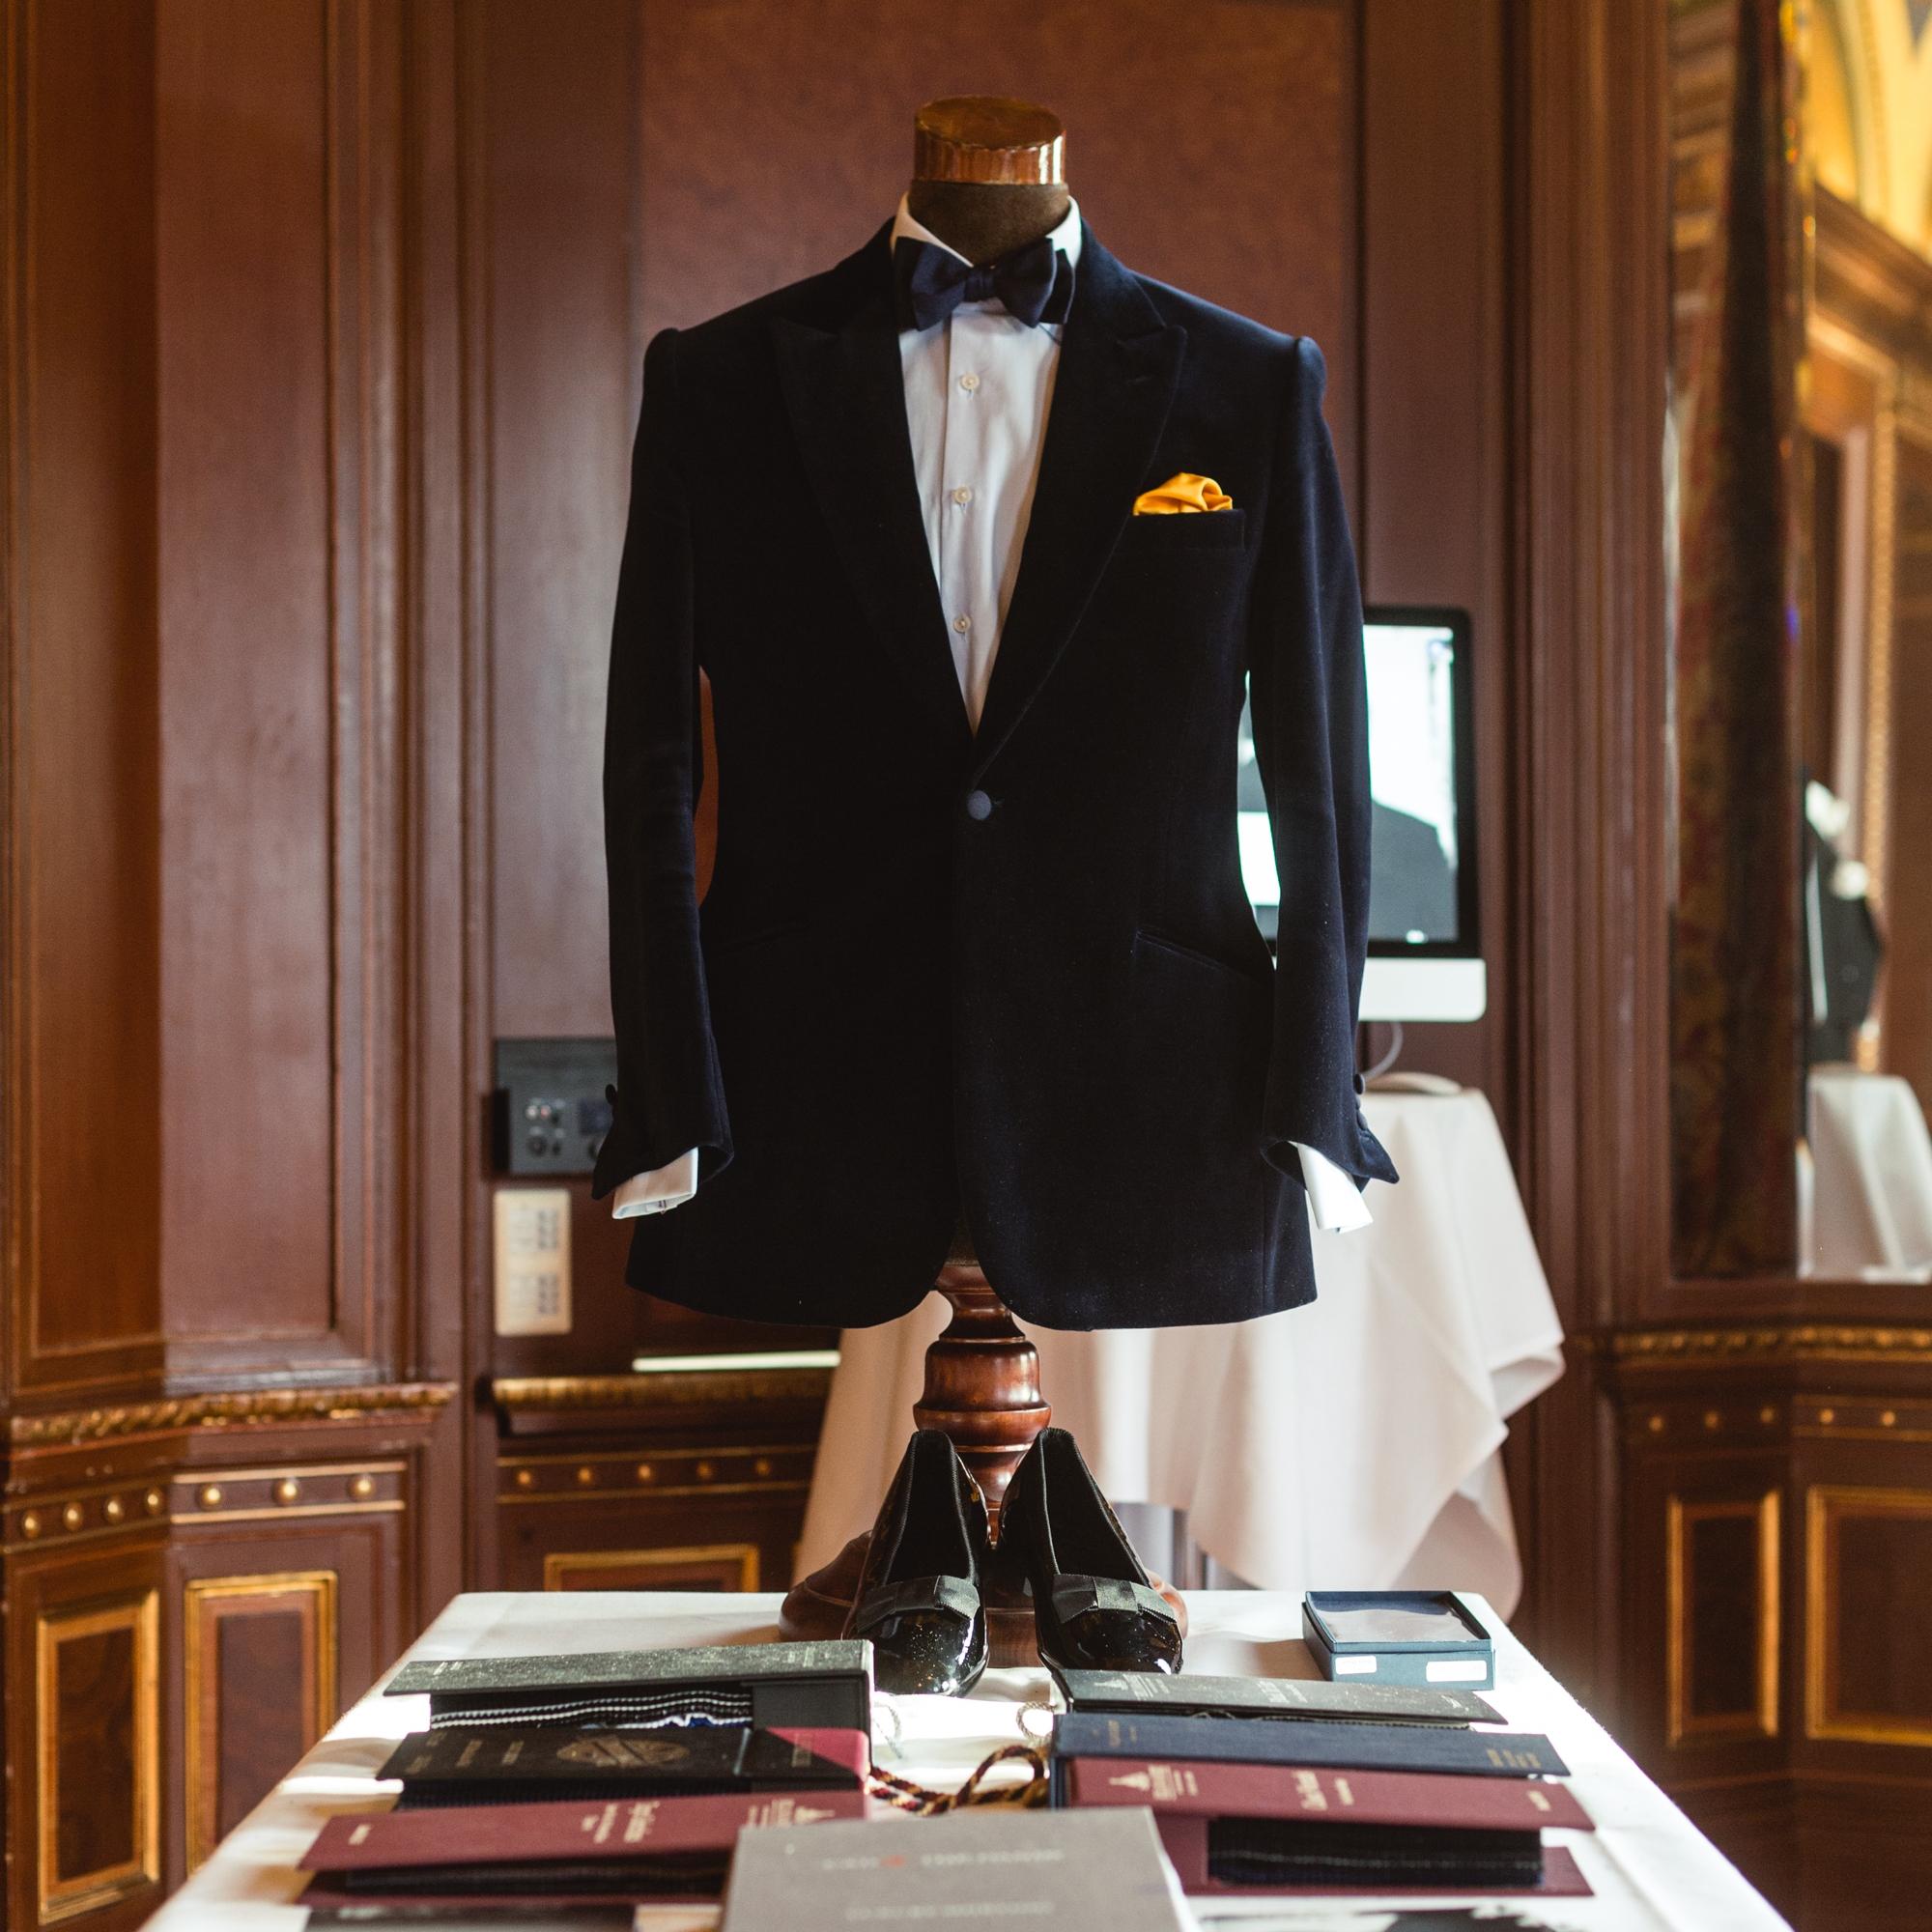 Single breasted Götrich Dinner Jacket in midnight blue velvet with peak lapels.